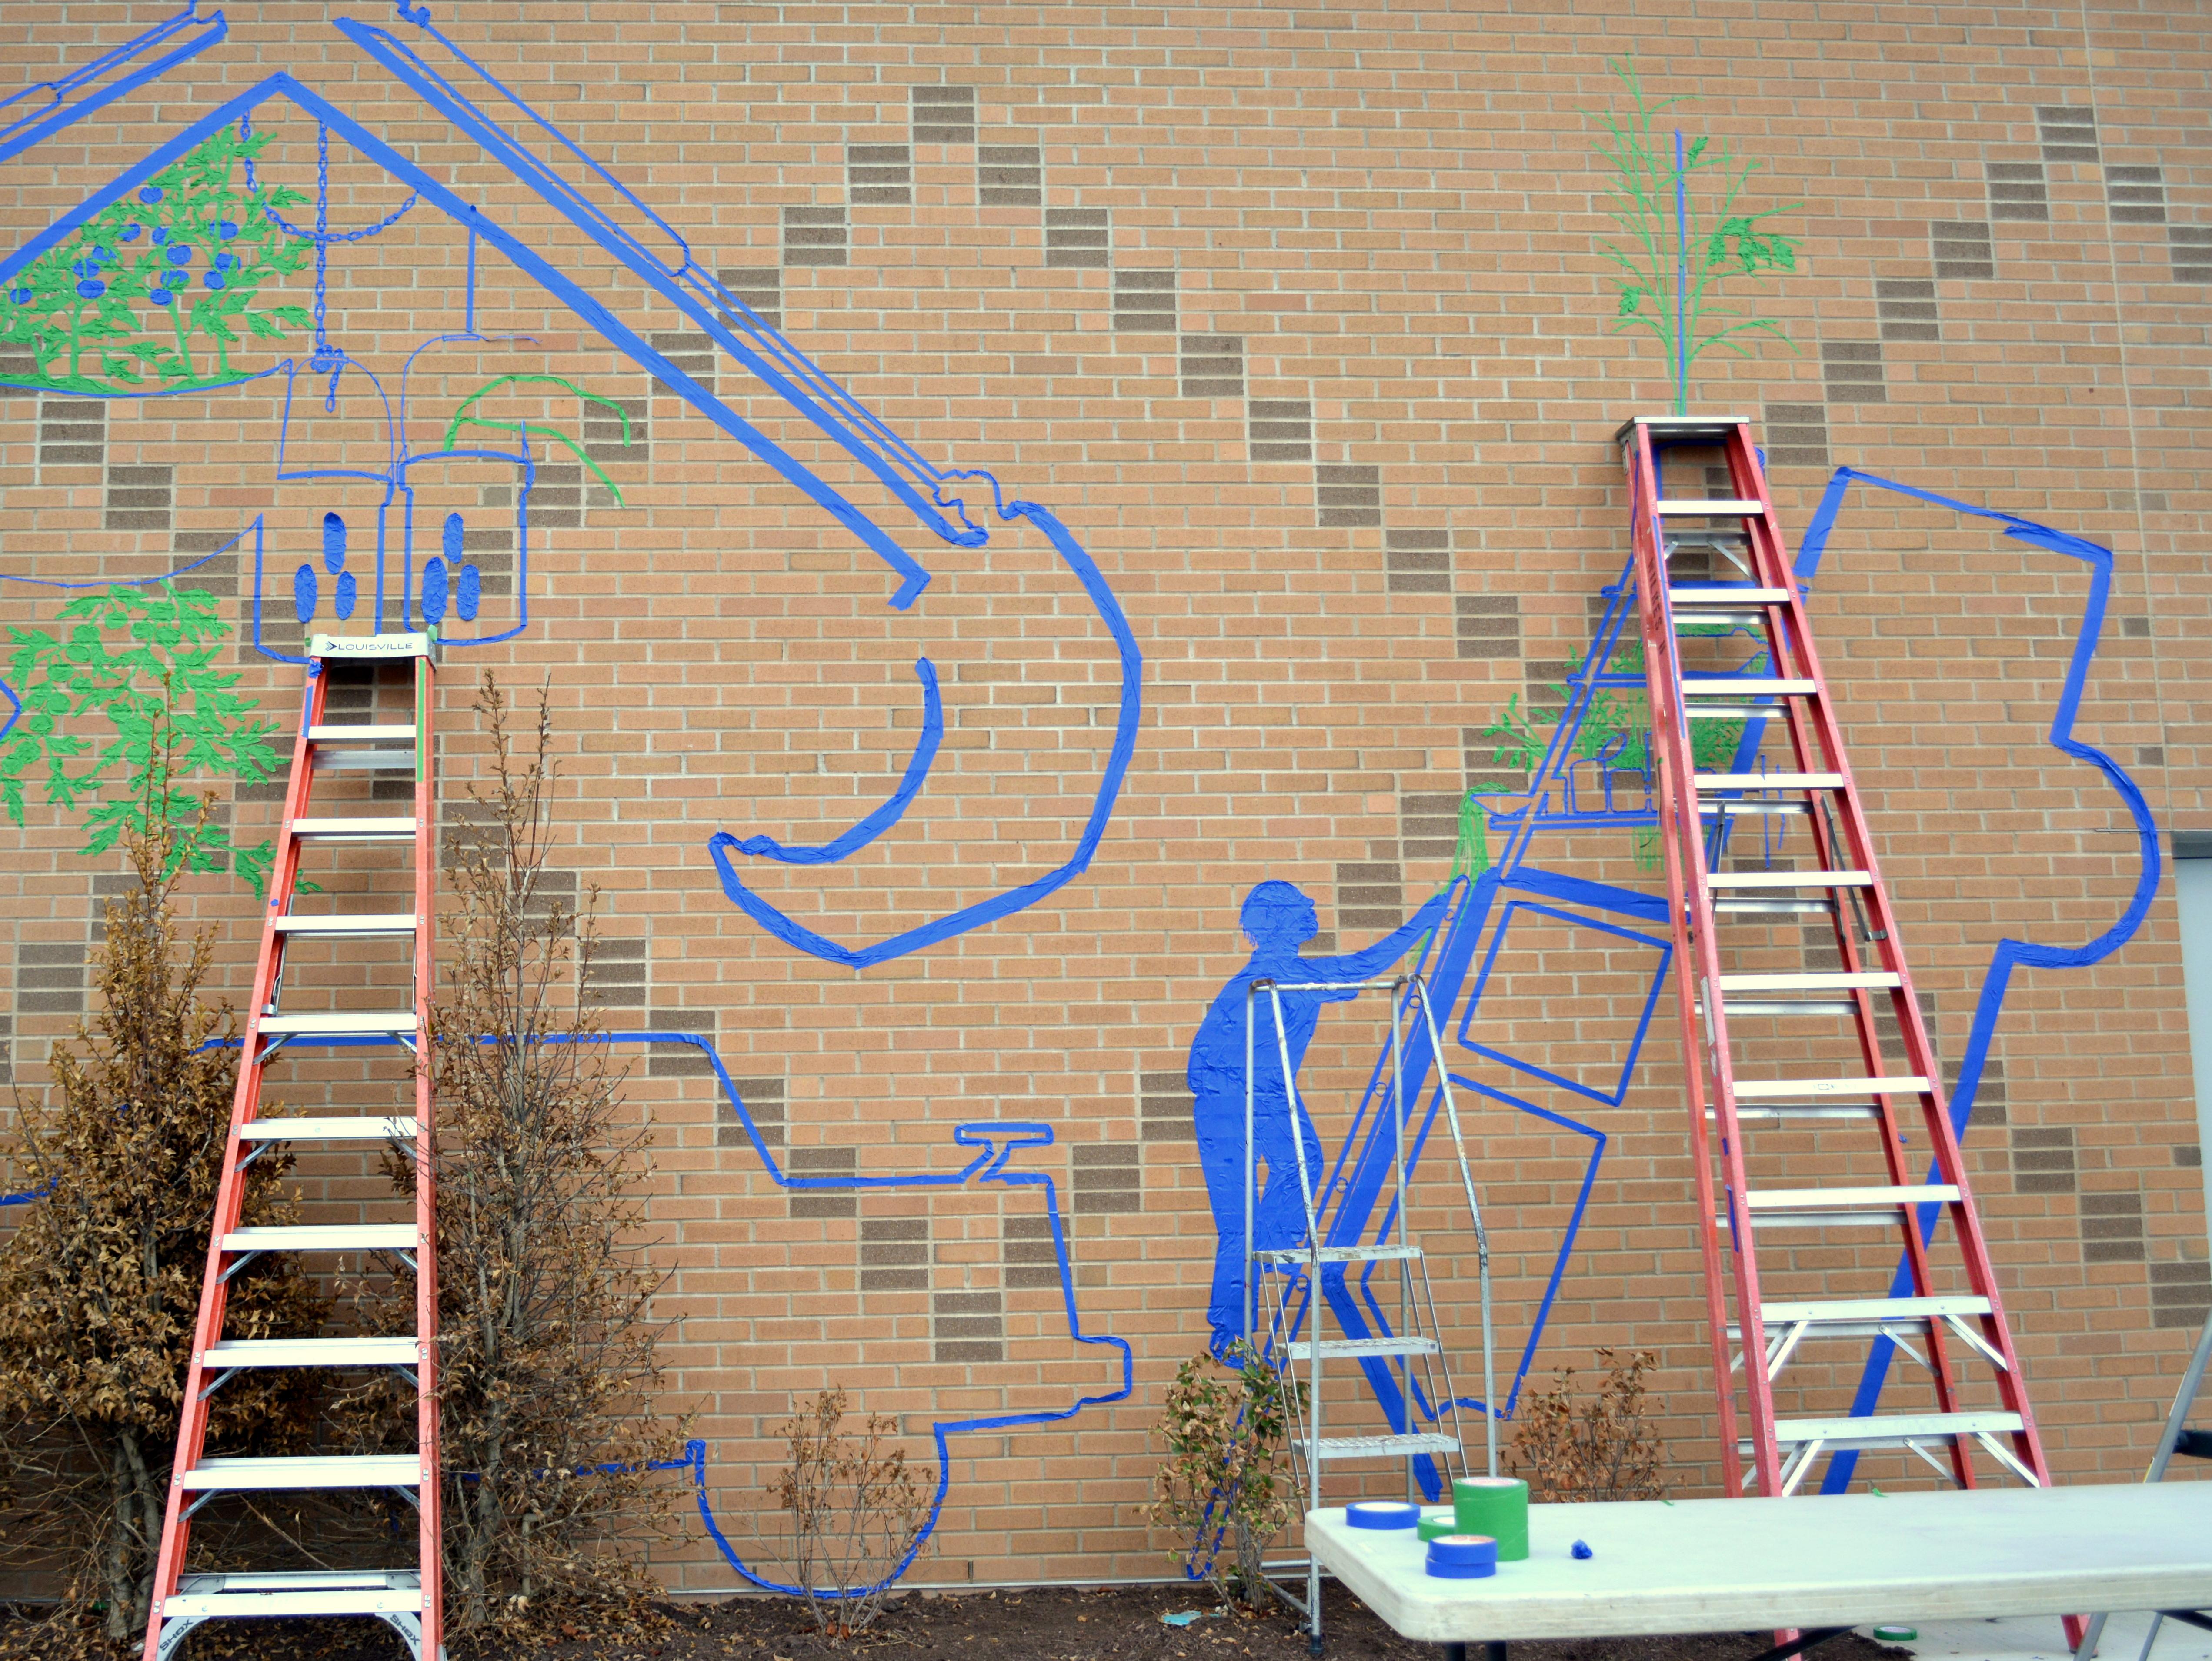 Community Corner: The Tape Art Crew Live Tape Mural